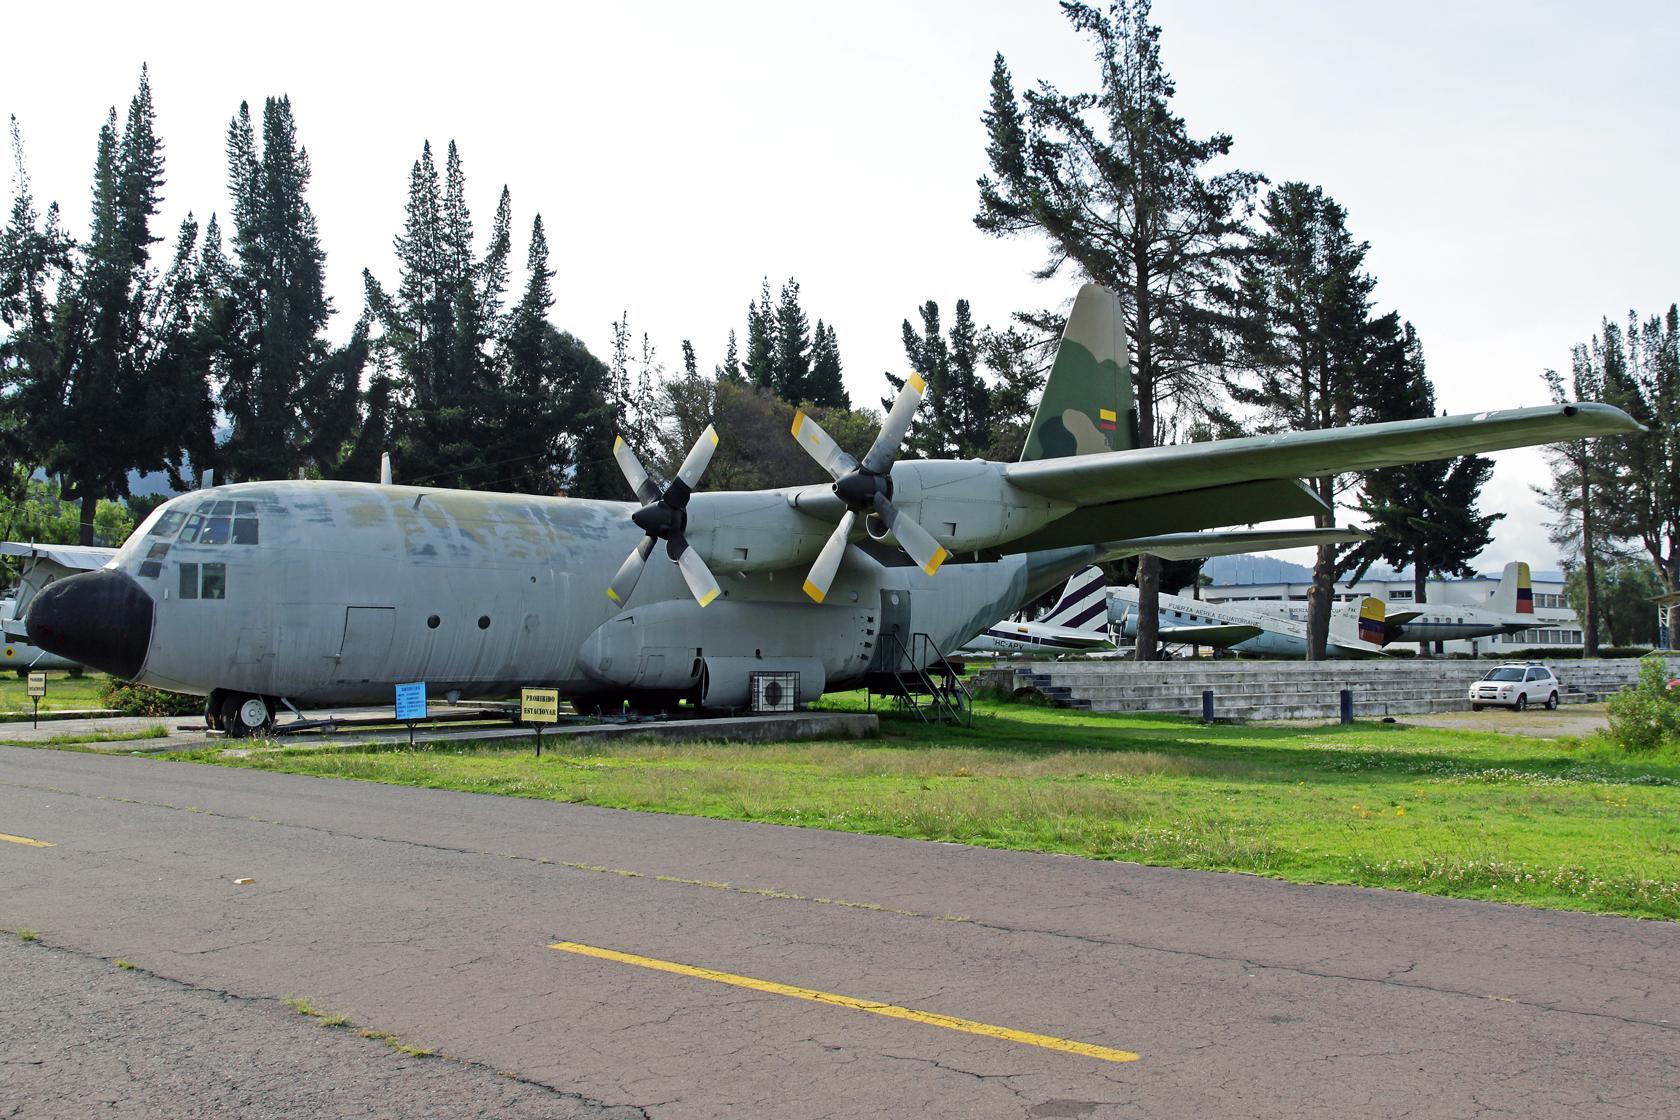 Fuerza Aérea Ecuatoriana Lockheed C-130B Hercules FAE-897